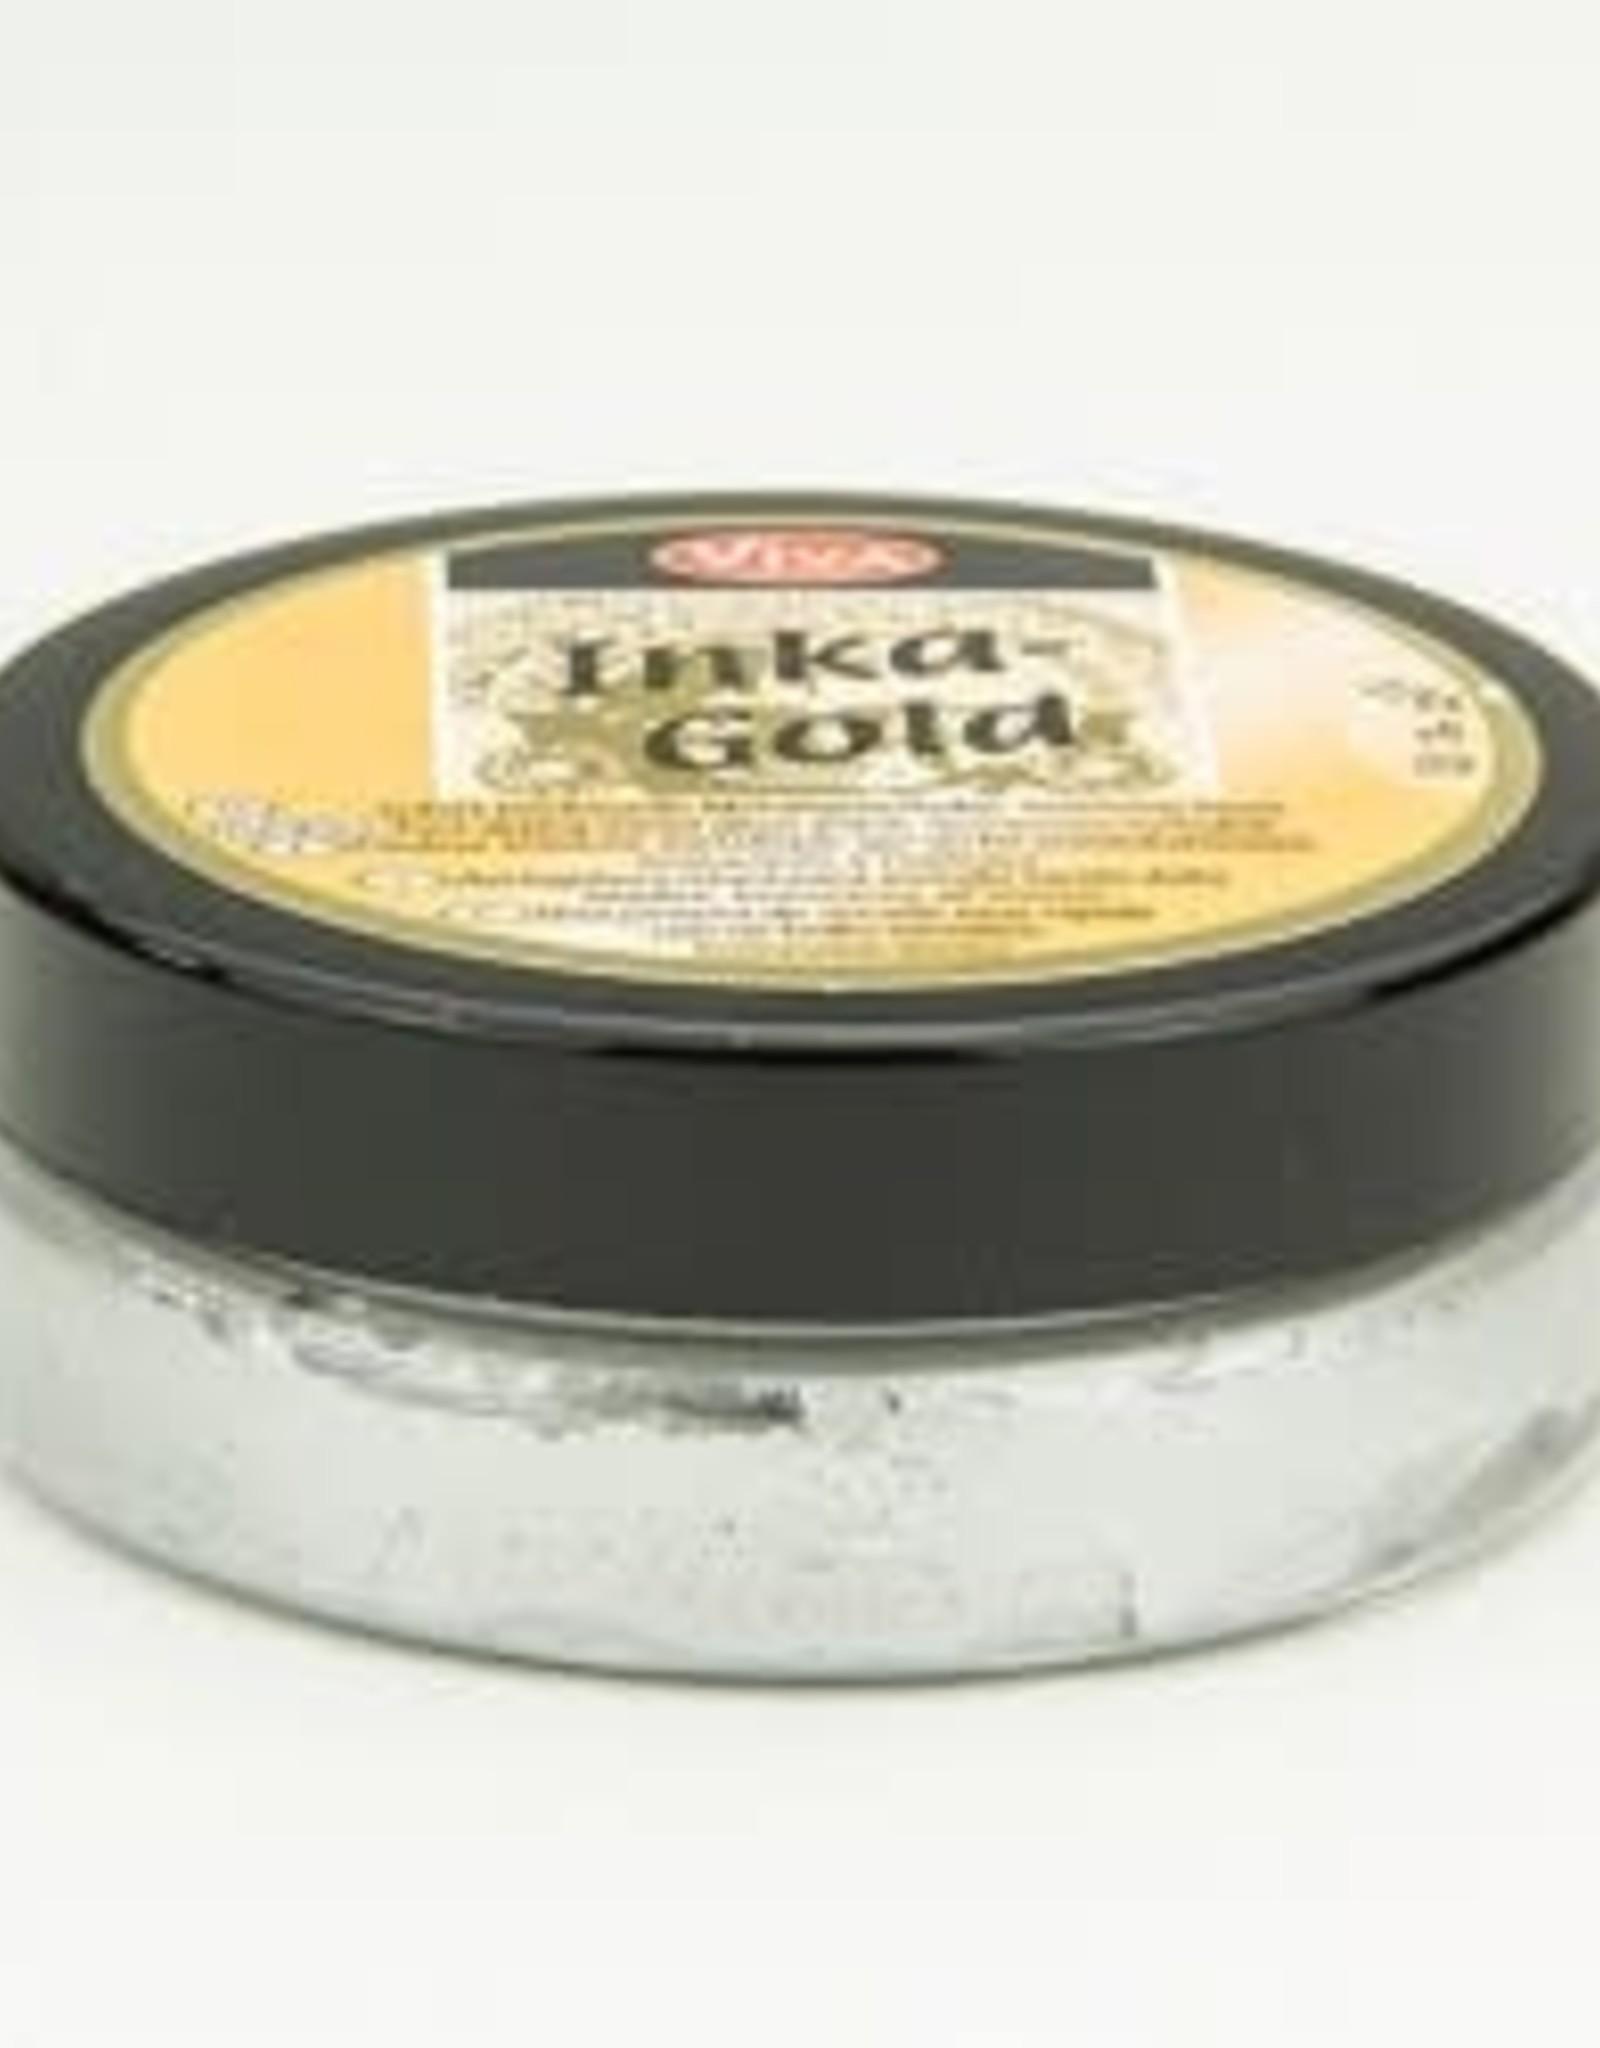 Inka-Gold Zilver